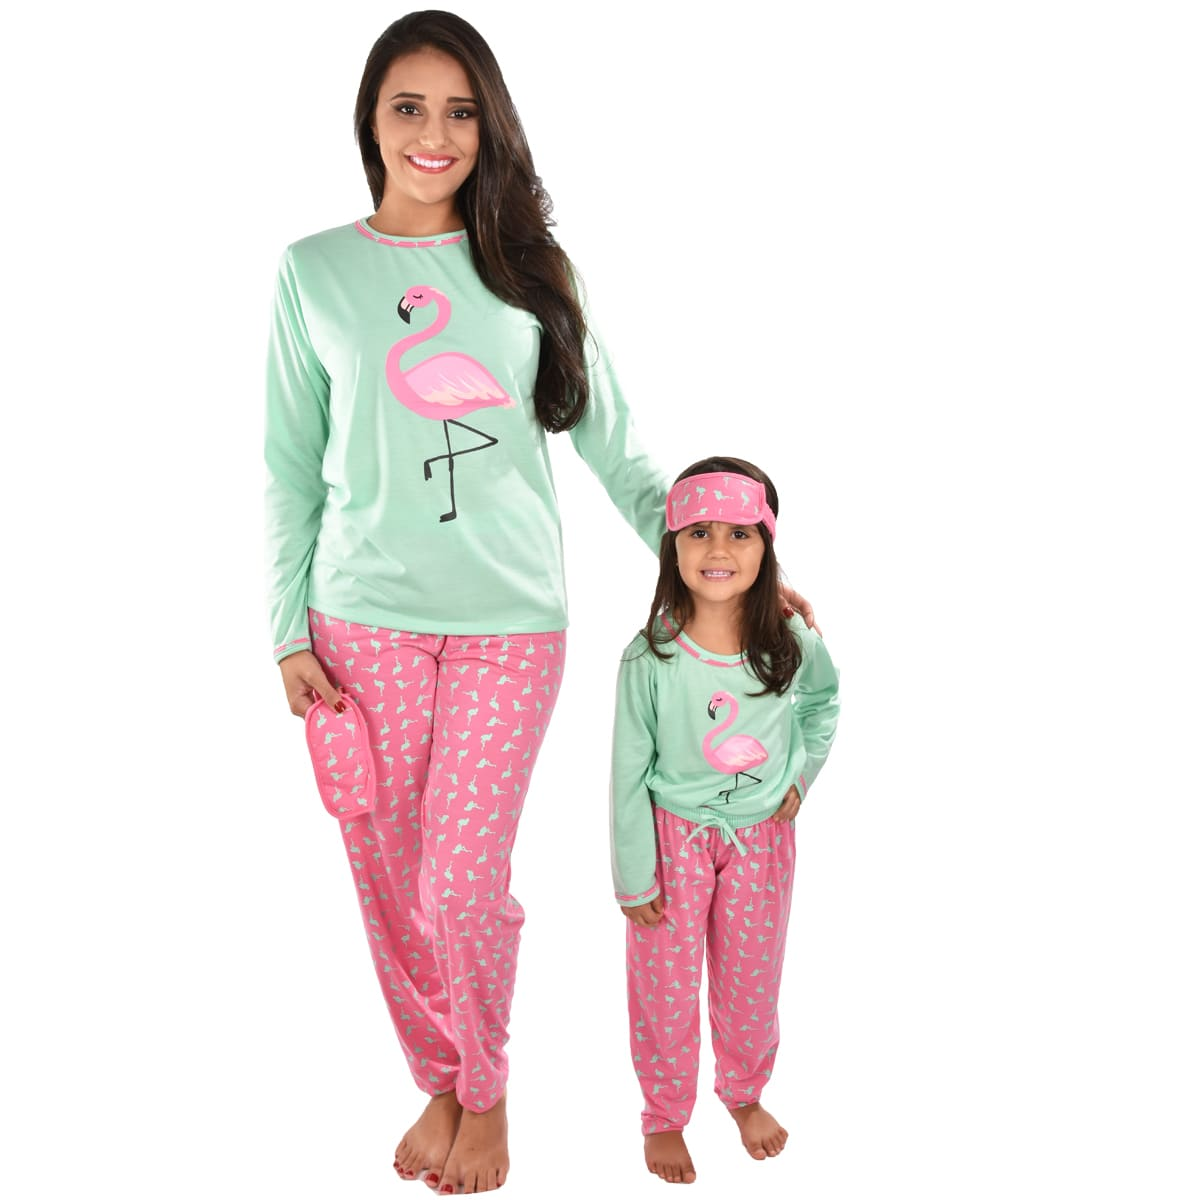 Pijama Longo Calça C/ Tapa Olho Feminino Adulto Estampa Desenho Flamingo 310